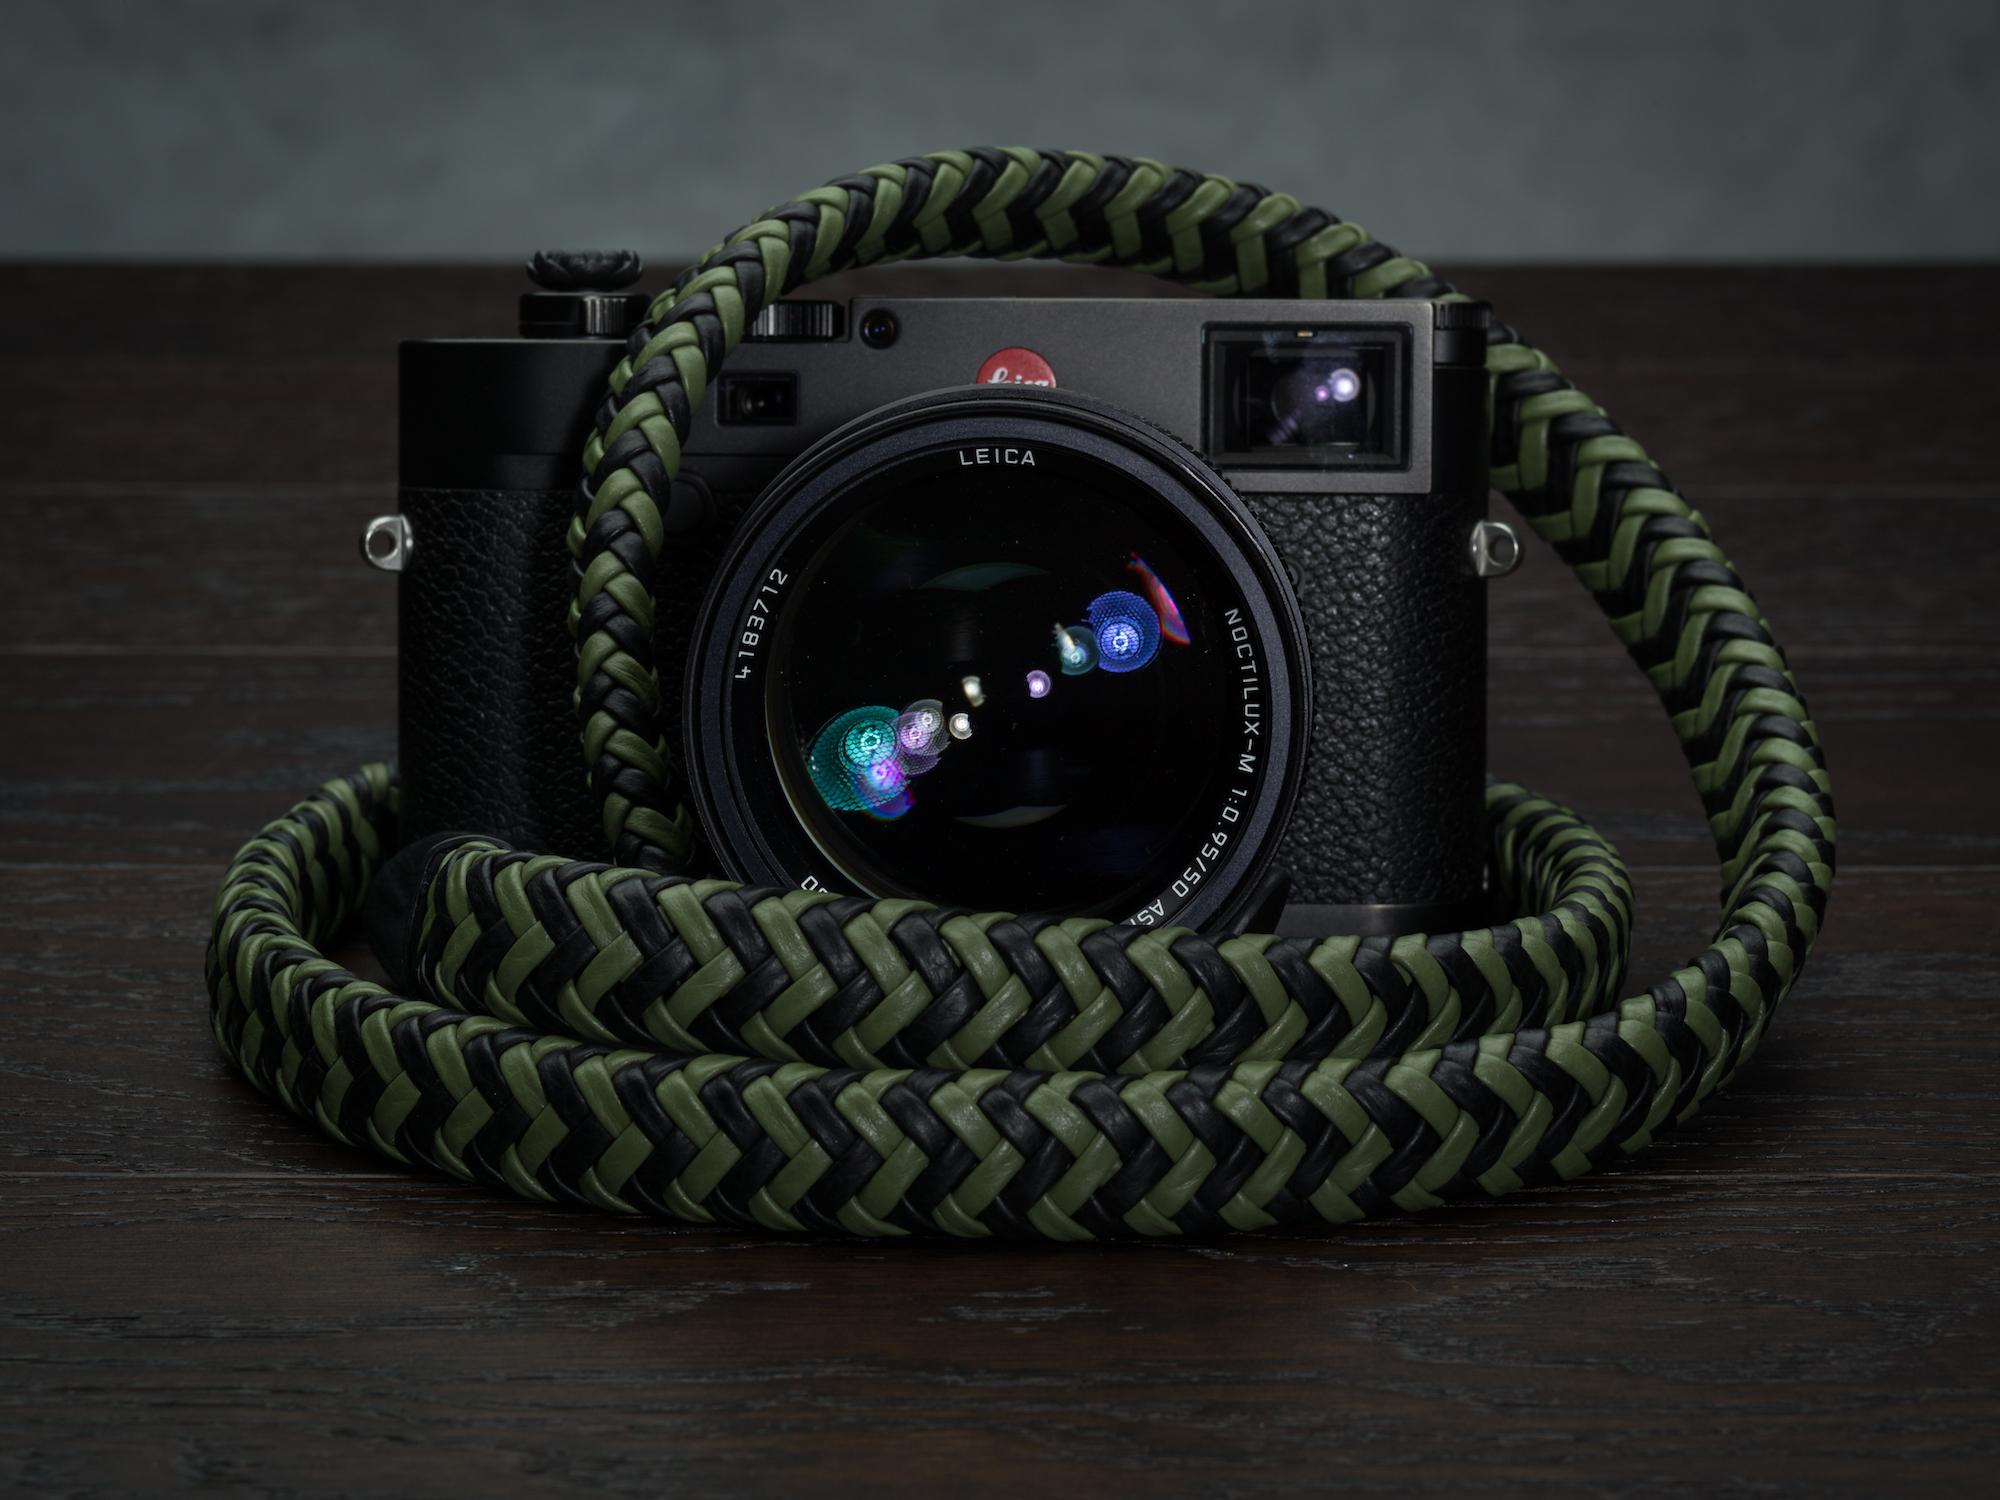 Vi Vante Matador Green Arrow Braided Luxury Leather Camera Strap Leica M10 Noctilux 2.jpg